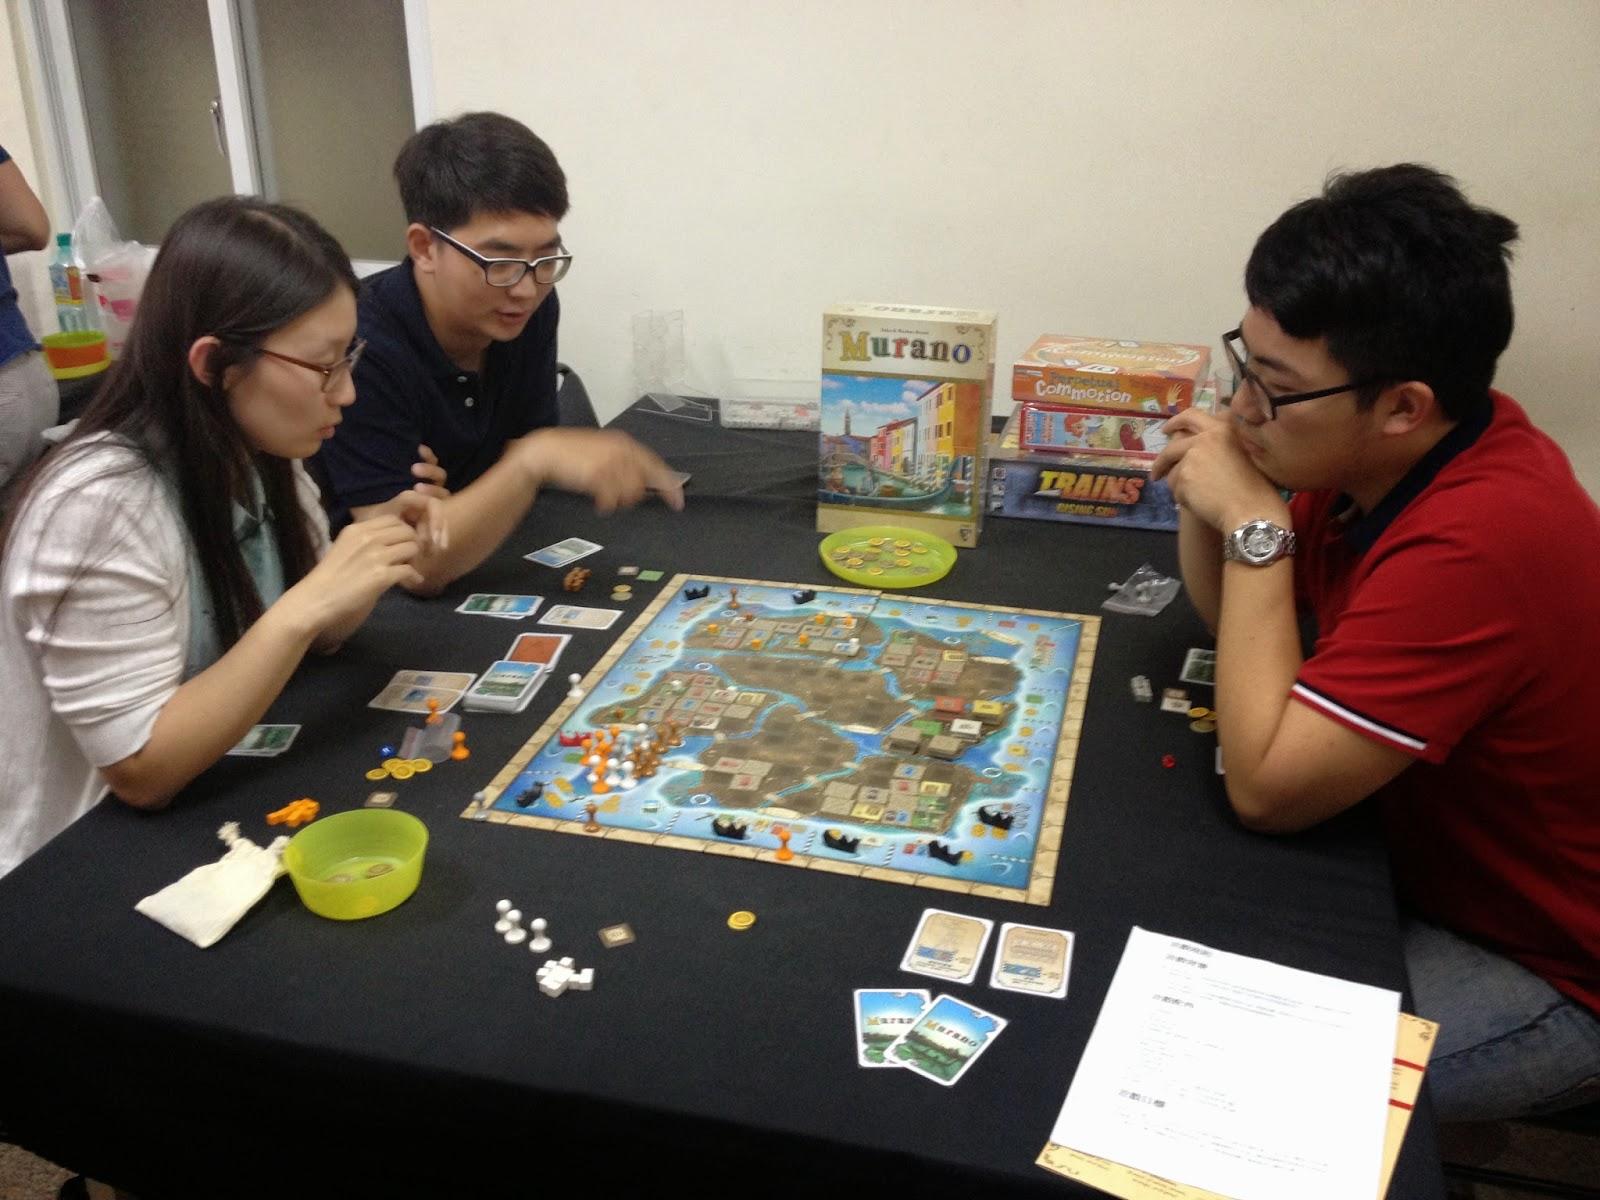 桌遊不只是遊戲 Boardgame is not just a game: 王牌409之歌~戰報心得